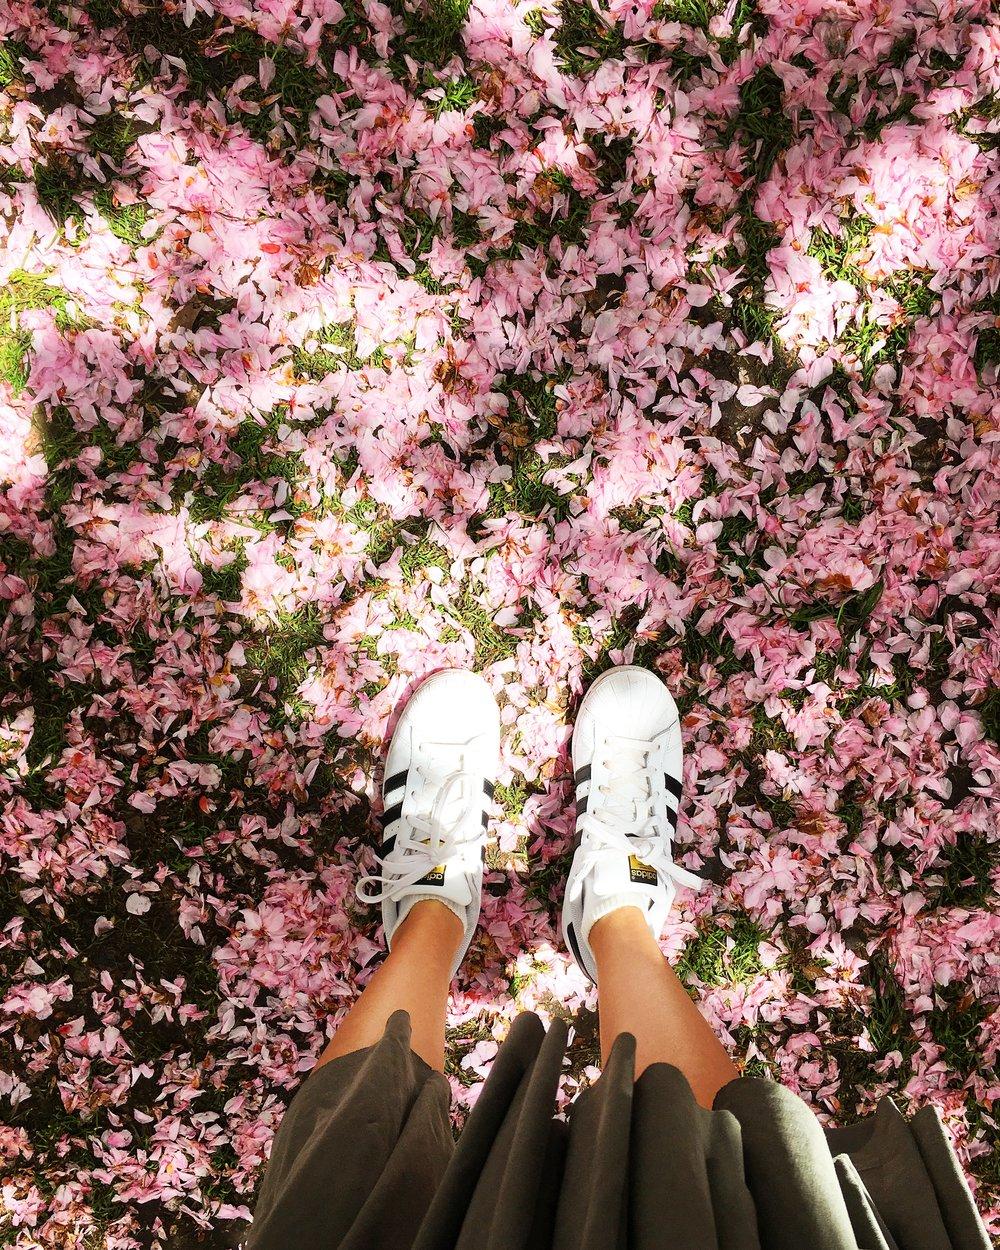 Cherry Blossom Festival, Brooklyn Botanic Garden, NY